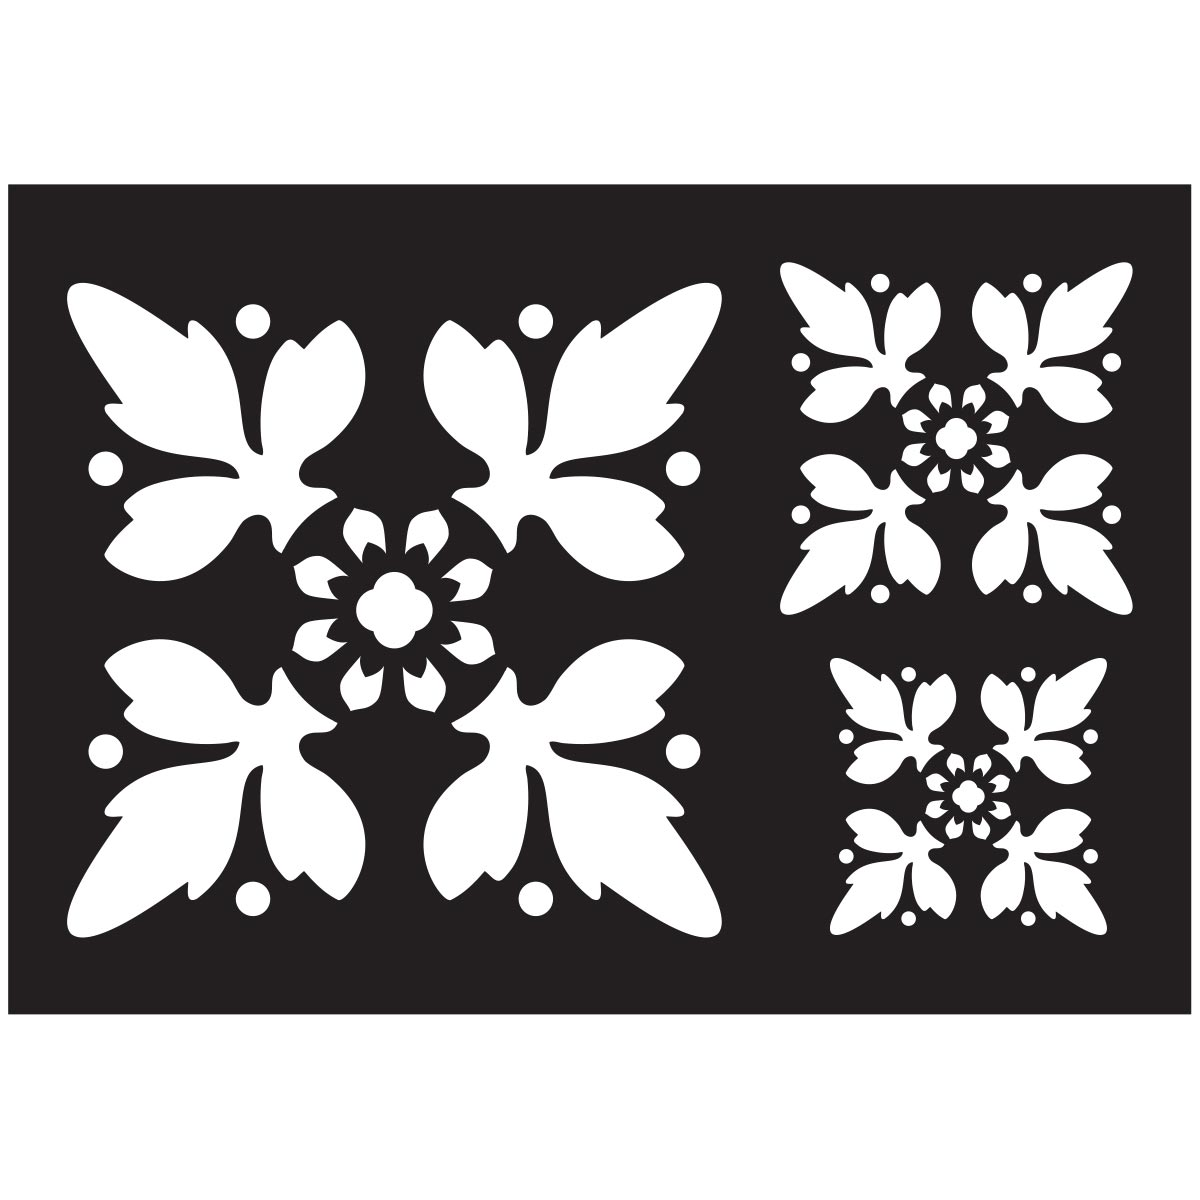 FolkArt ® Painting Stencils - Tile Motif